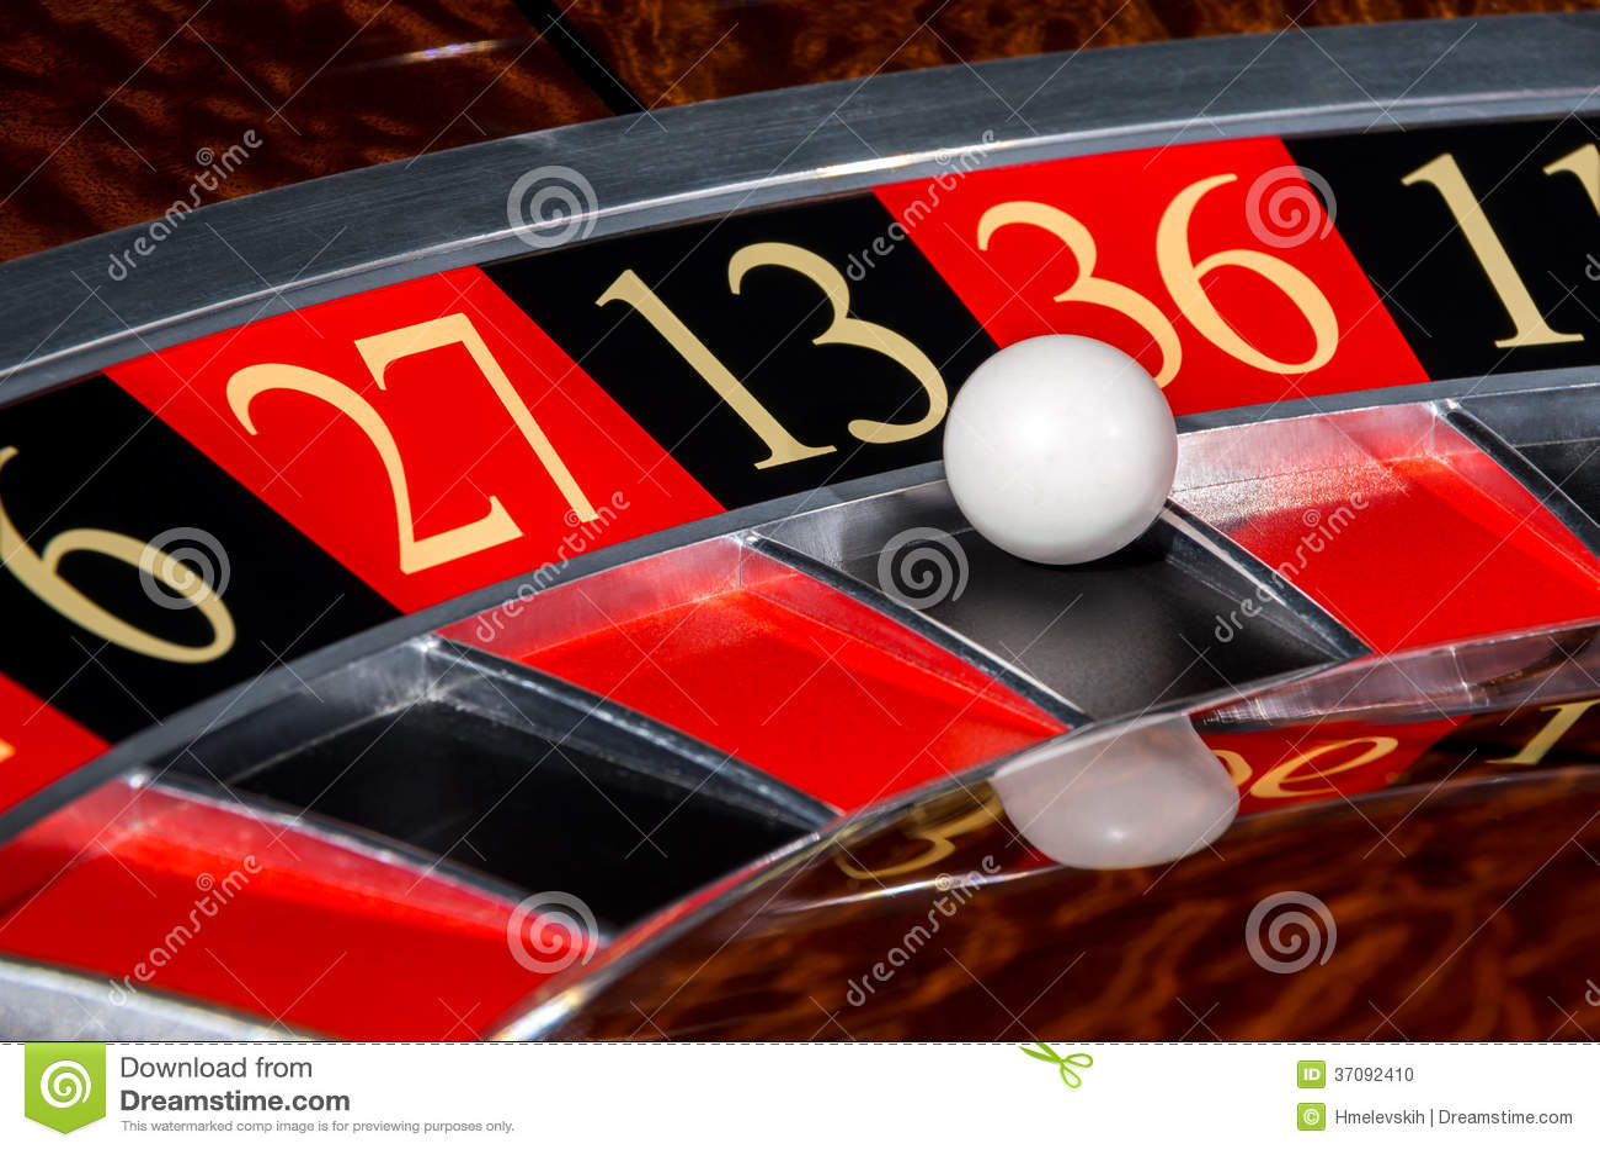 Wikipedia roulette odds